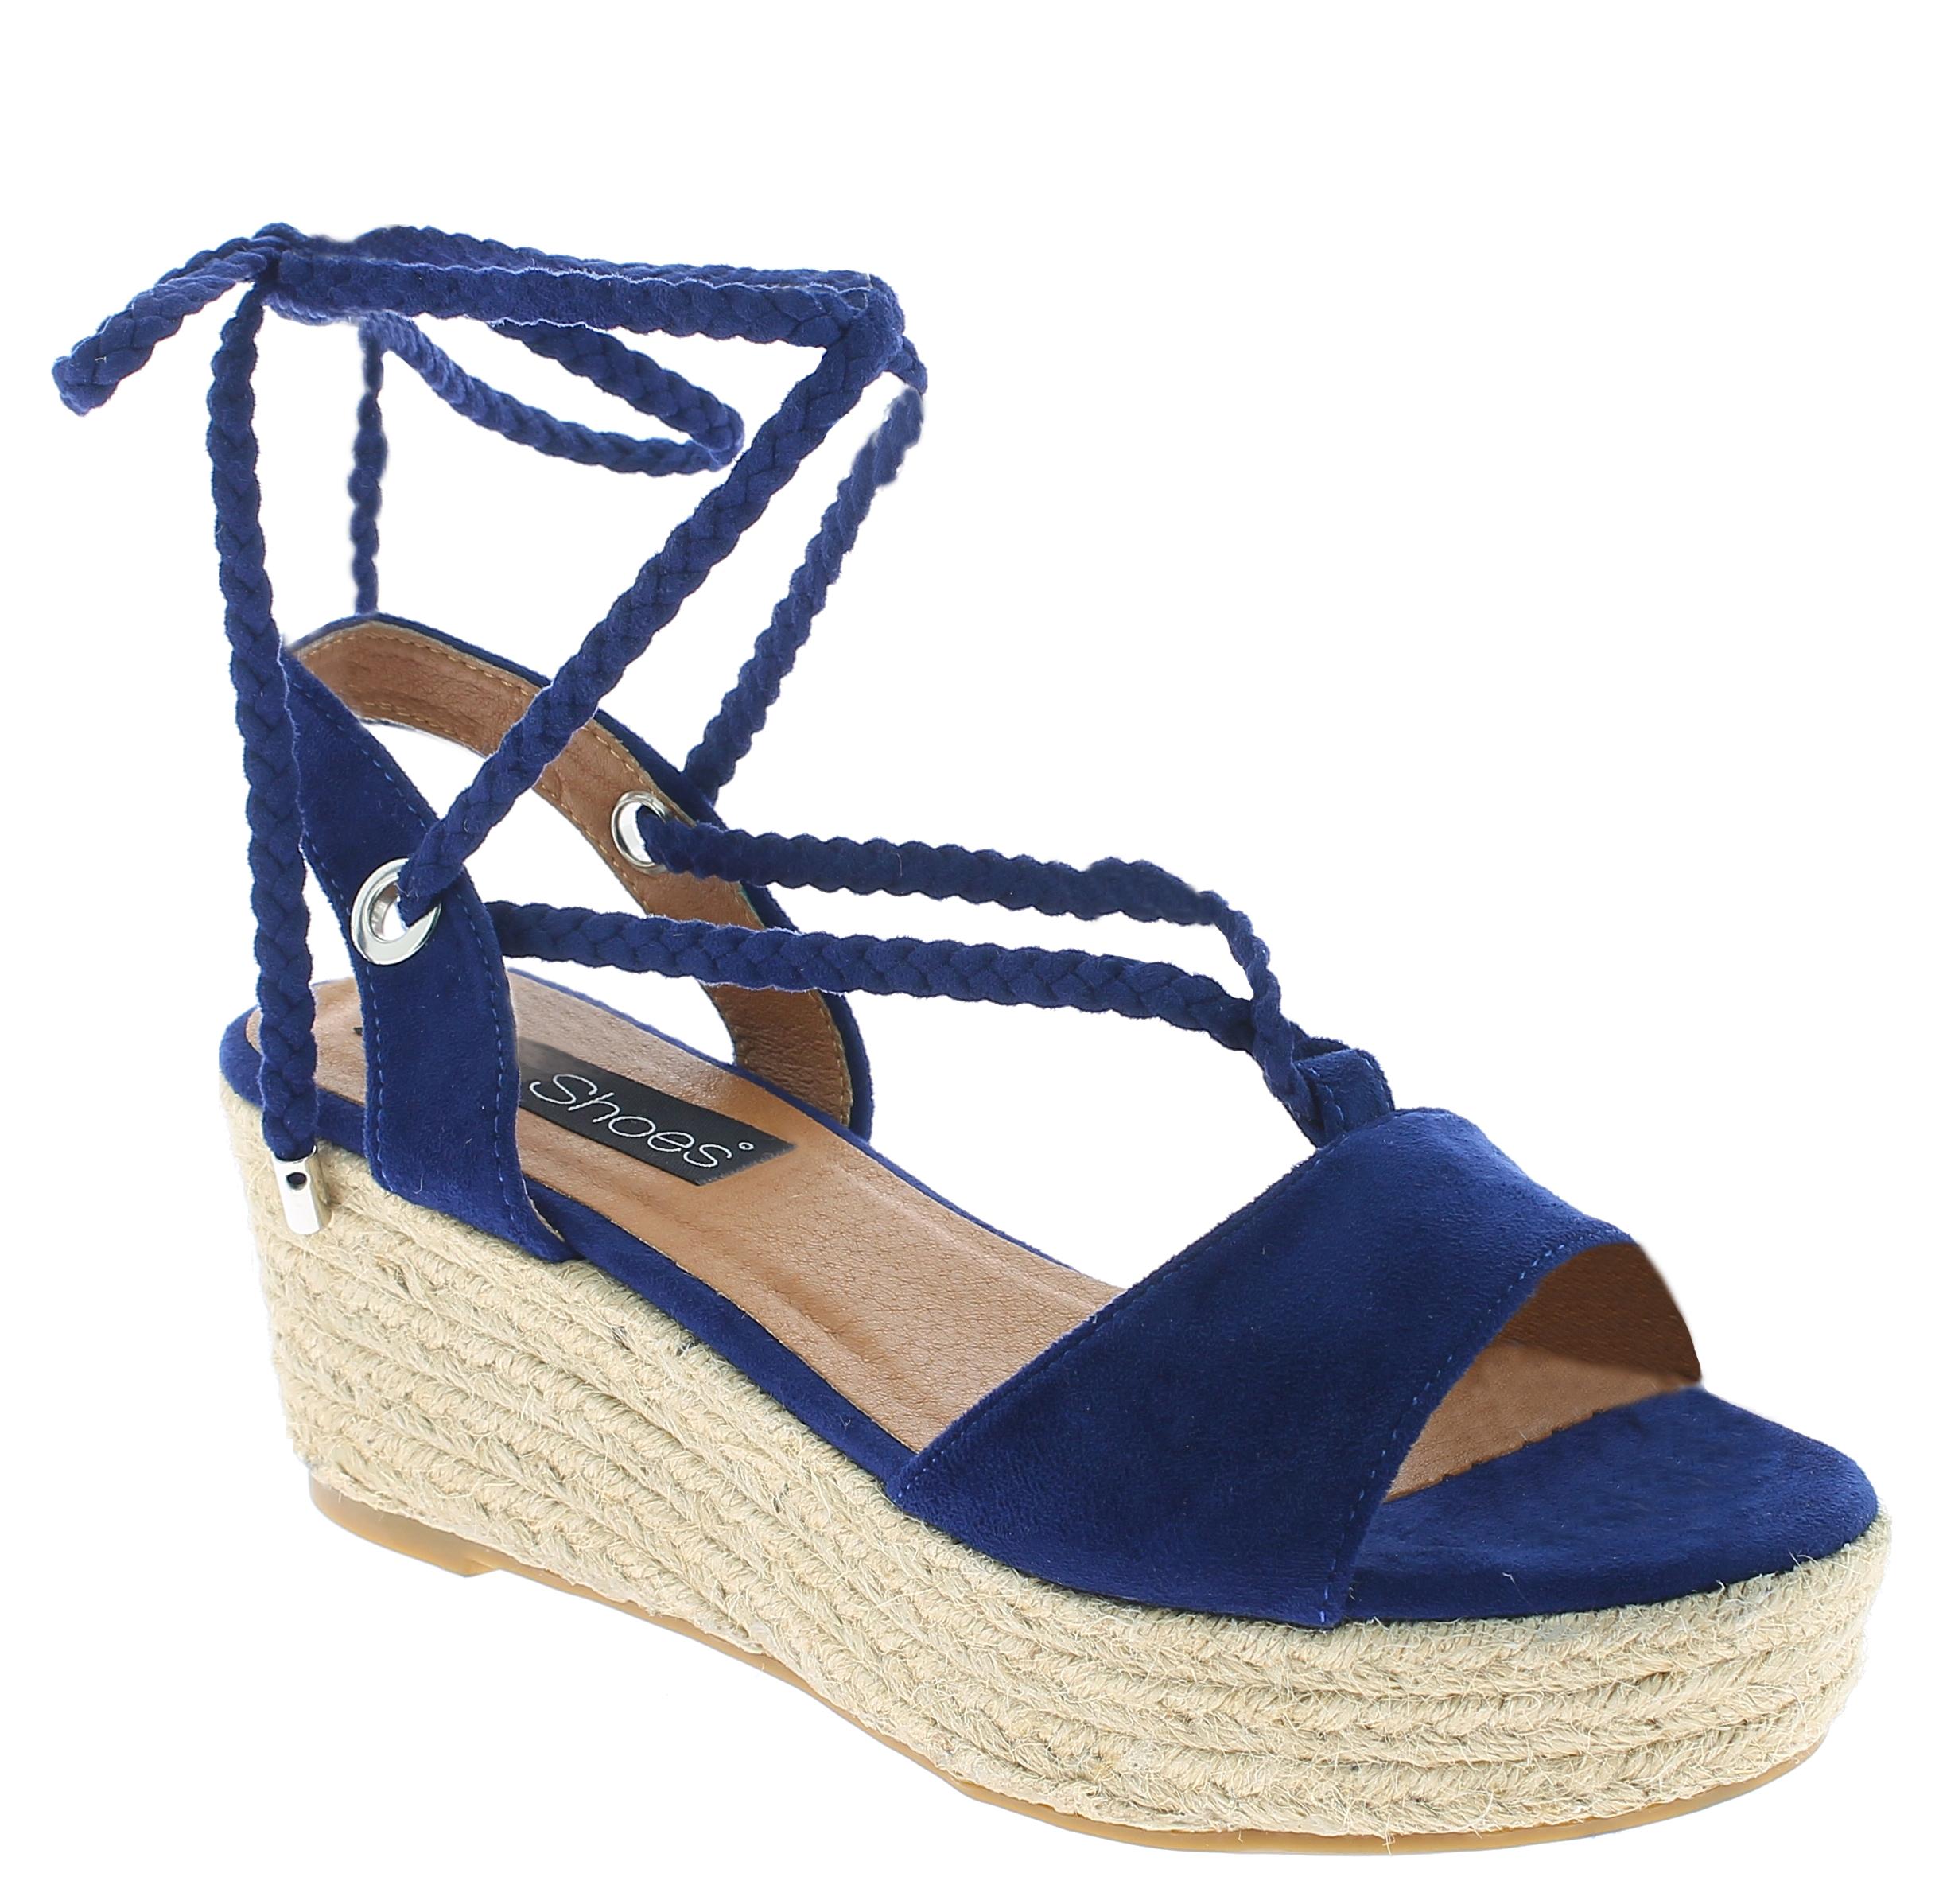 IQSHOES Γυναικεία Πλατφόρμα 3A363 Μπλέ - IqShoes - 3A363 BLUE-blue-36/1/23/7 παπούτσια  πέδιλα